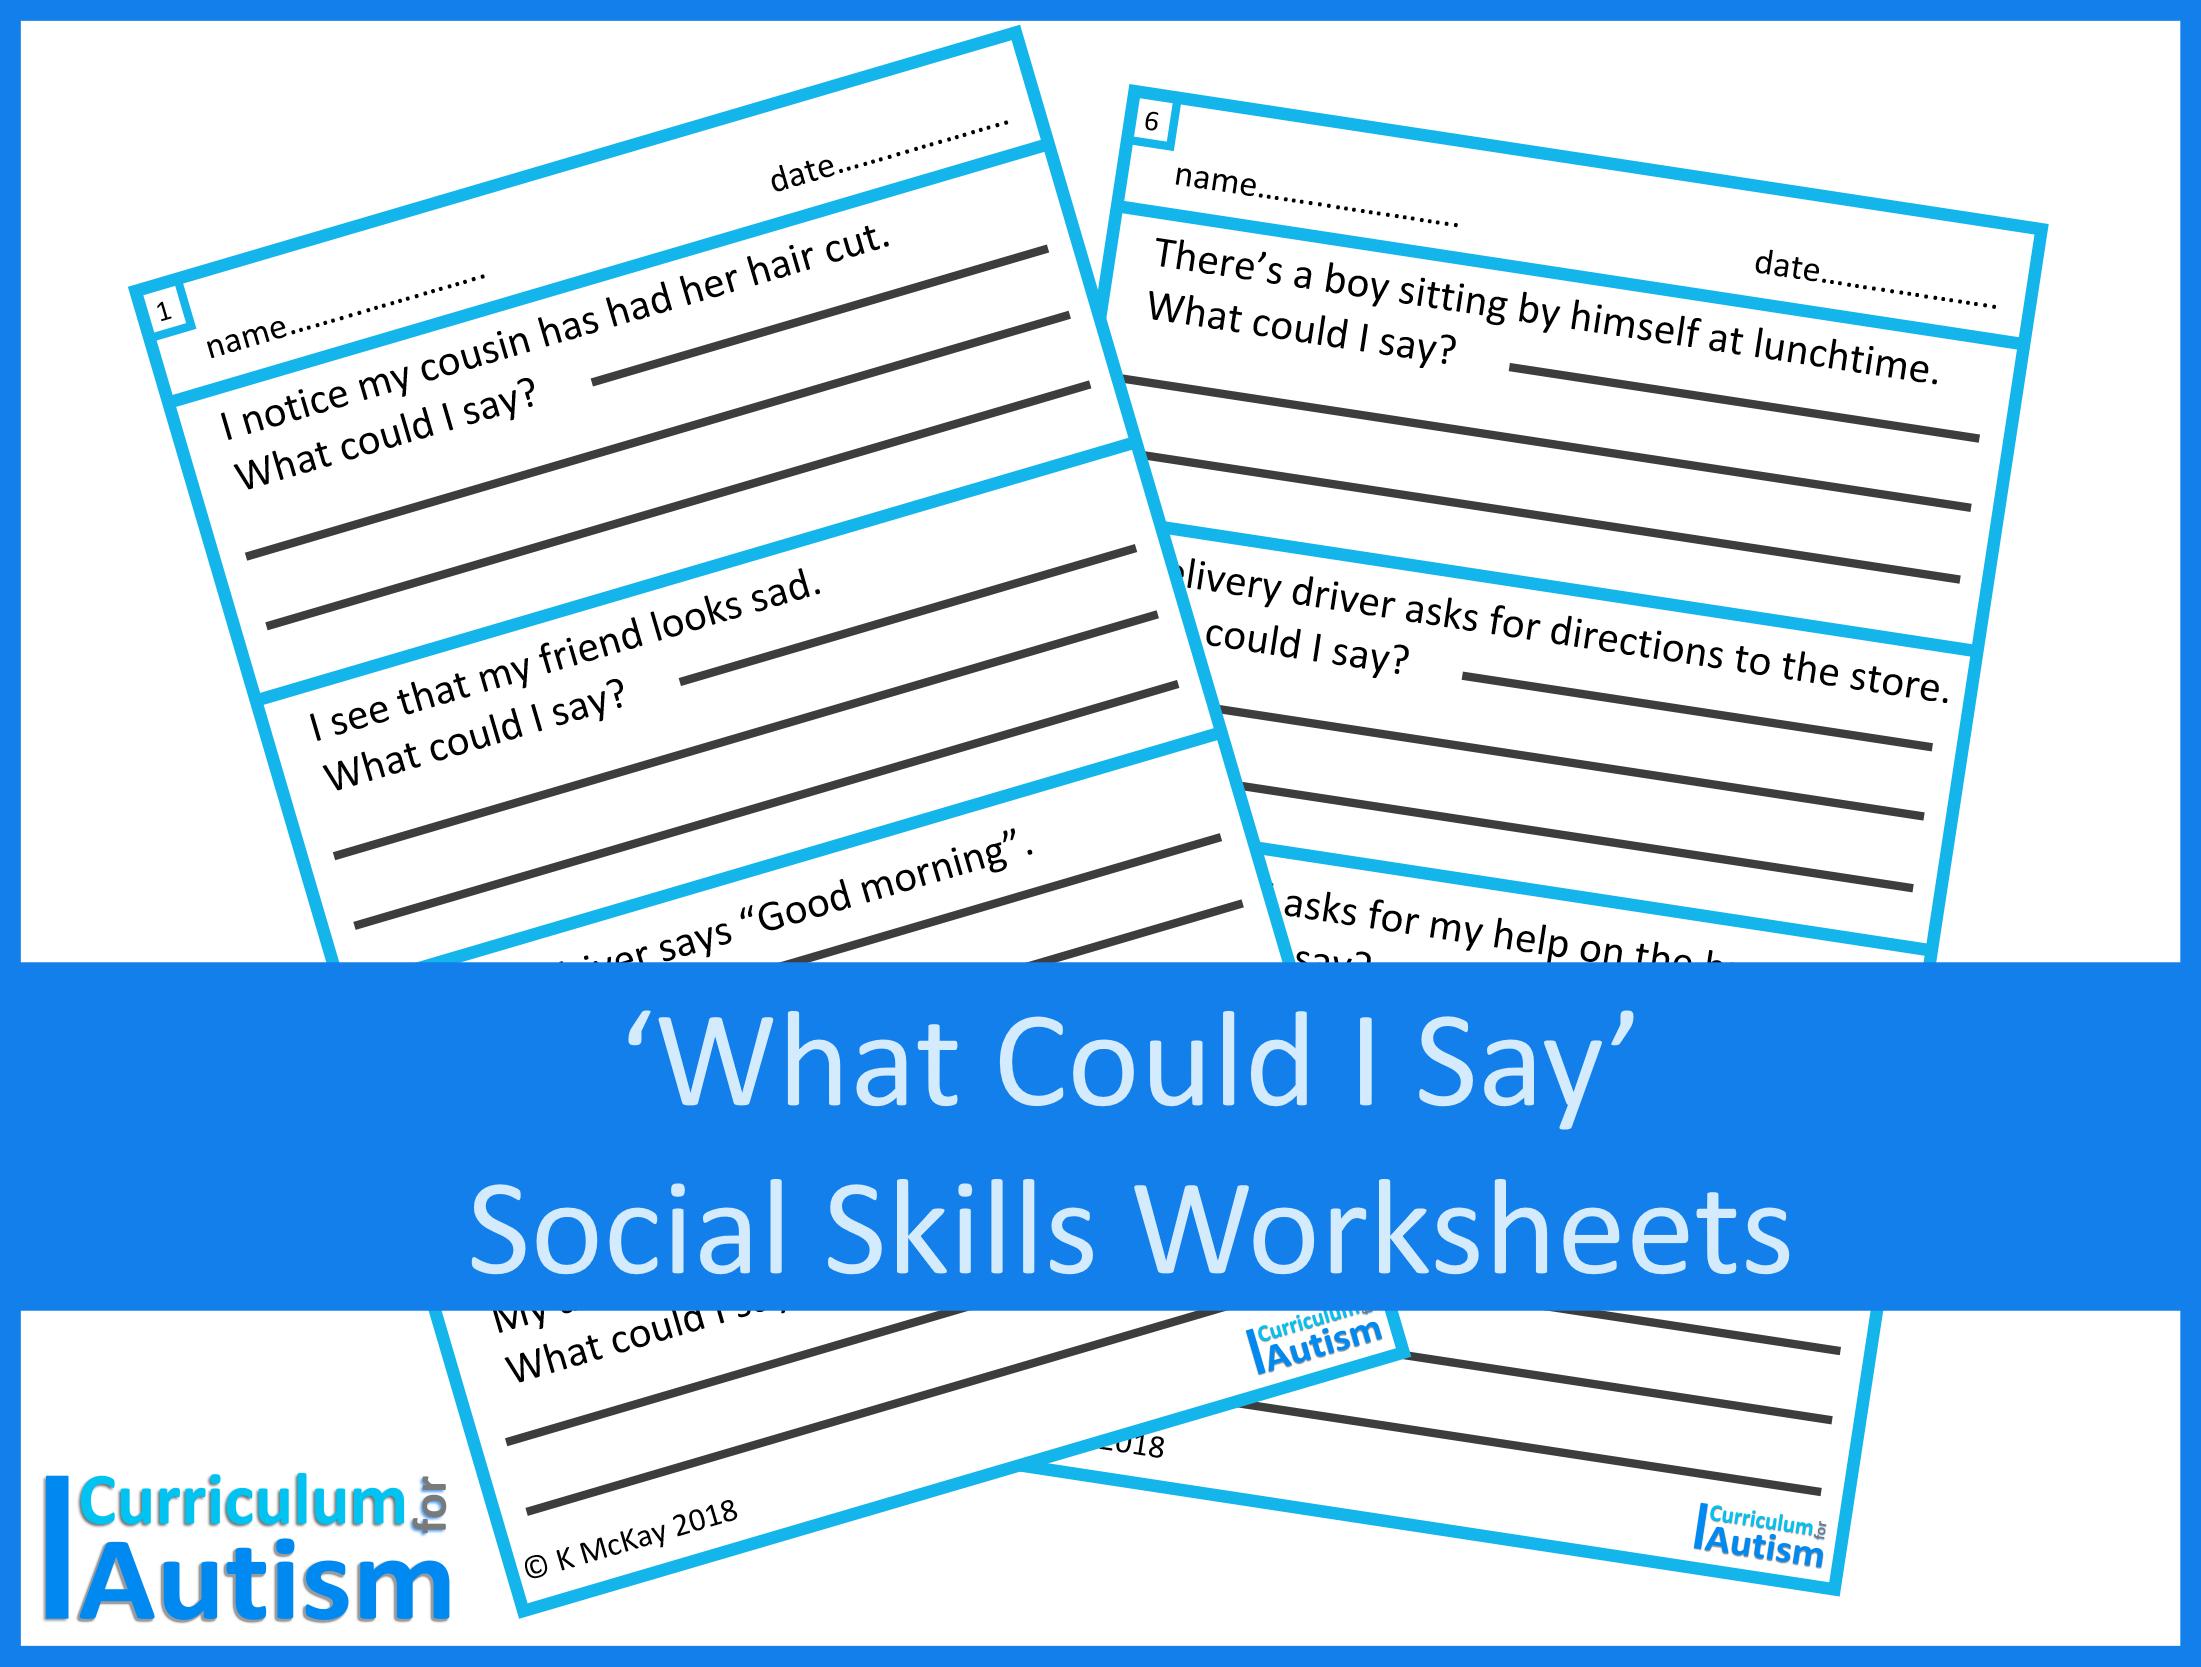 Social Skills What Could I Say Scenarios Worksheets